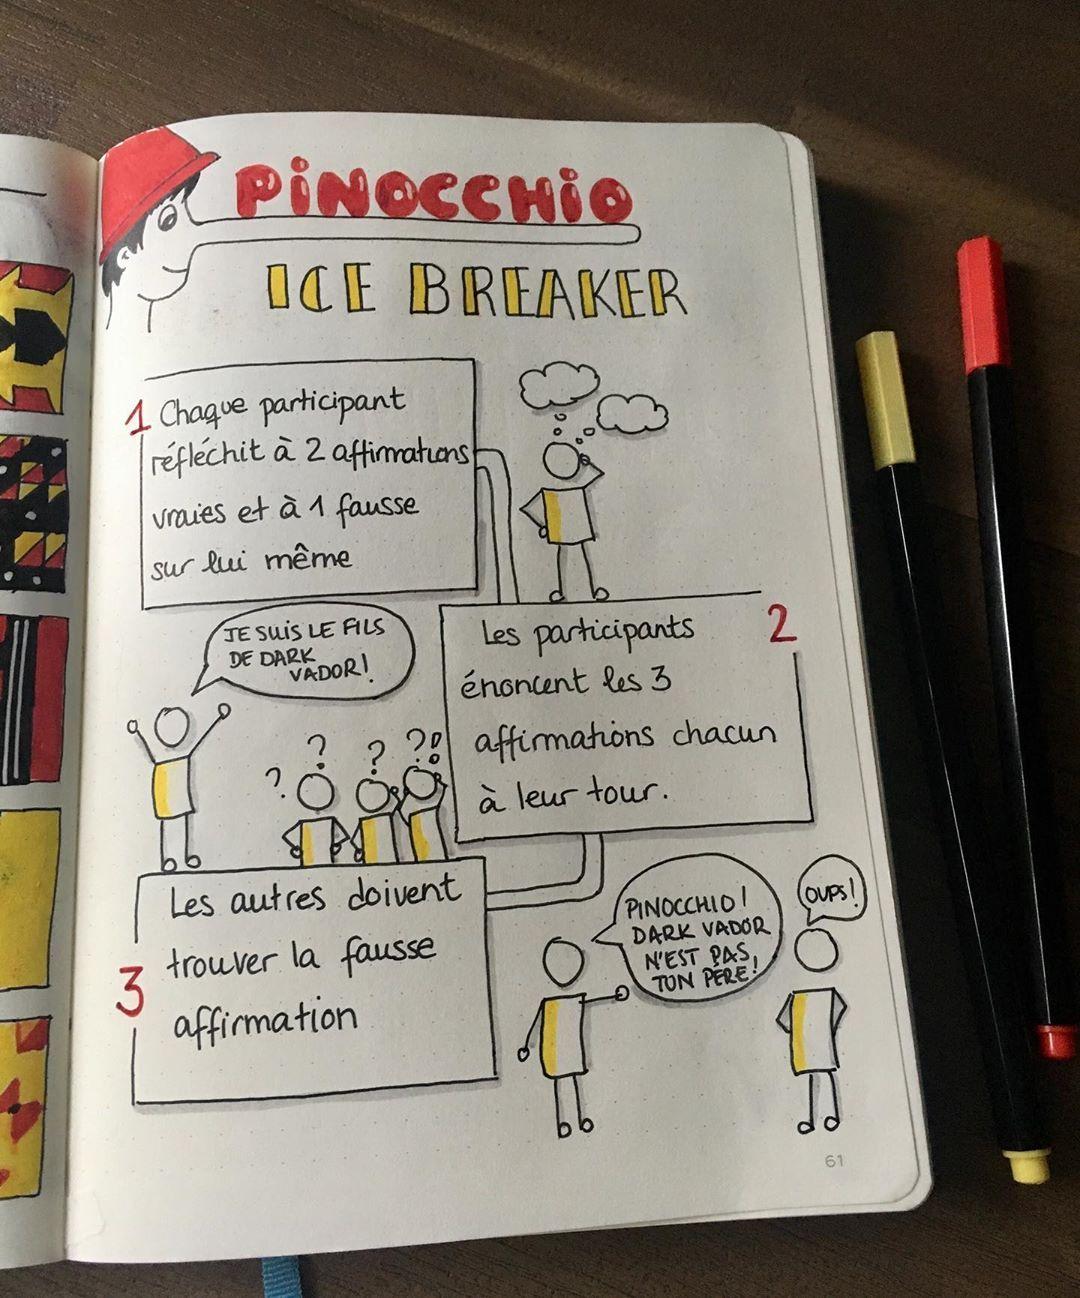 Ice Breaker - PINOCCHIO  #sketchnotes #visualthinking # ...